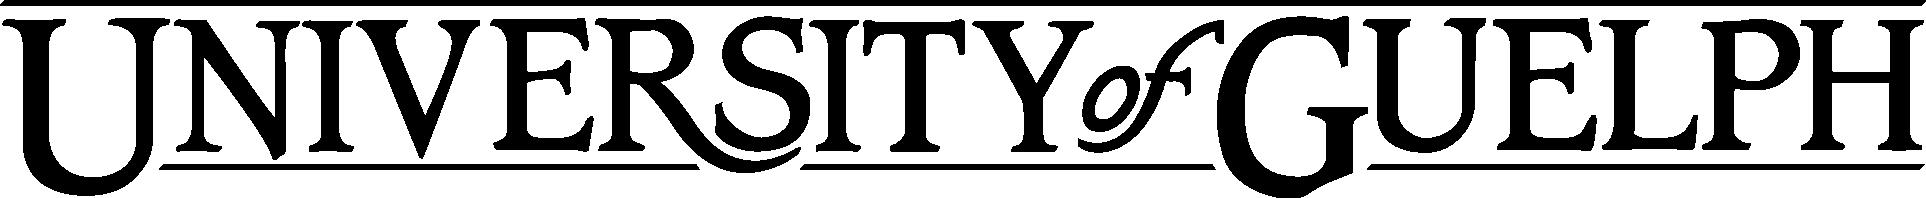 University of Guelph horizantal Identifier logotype